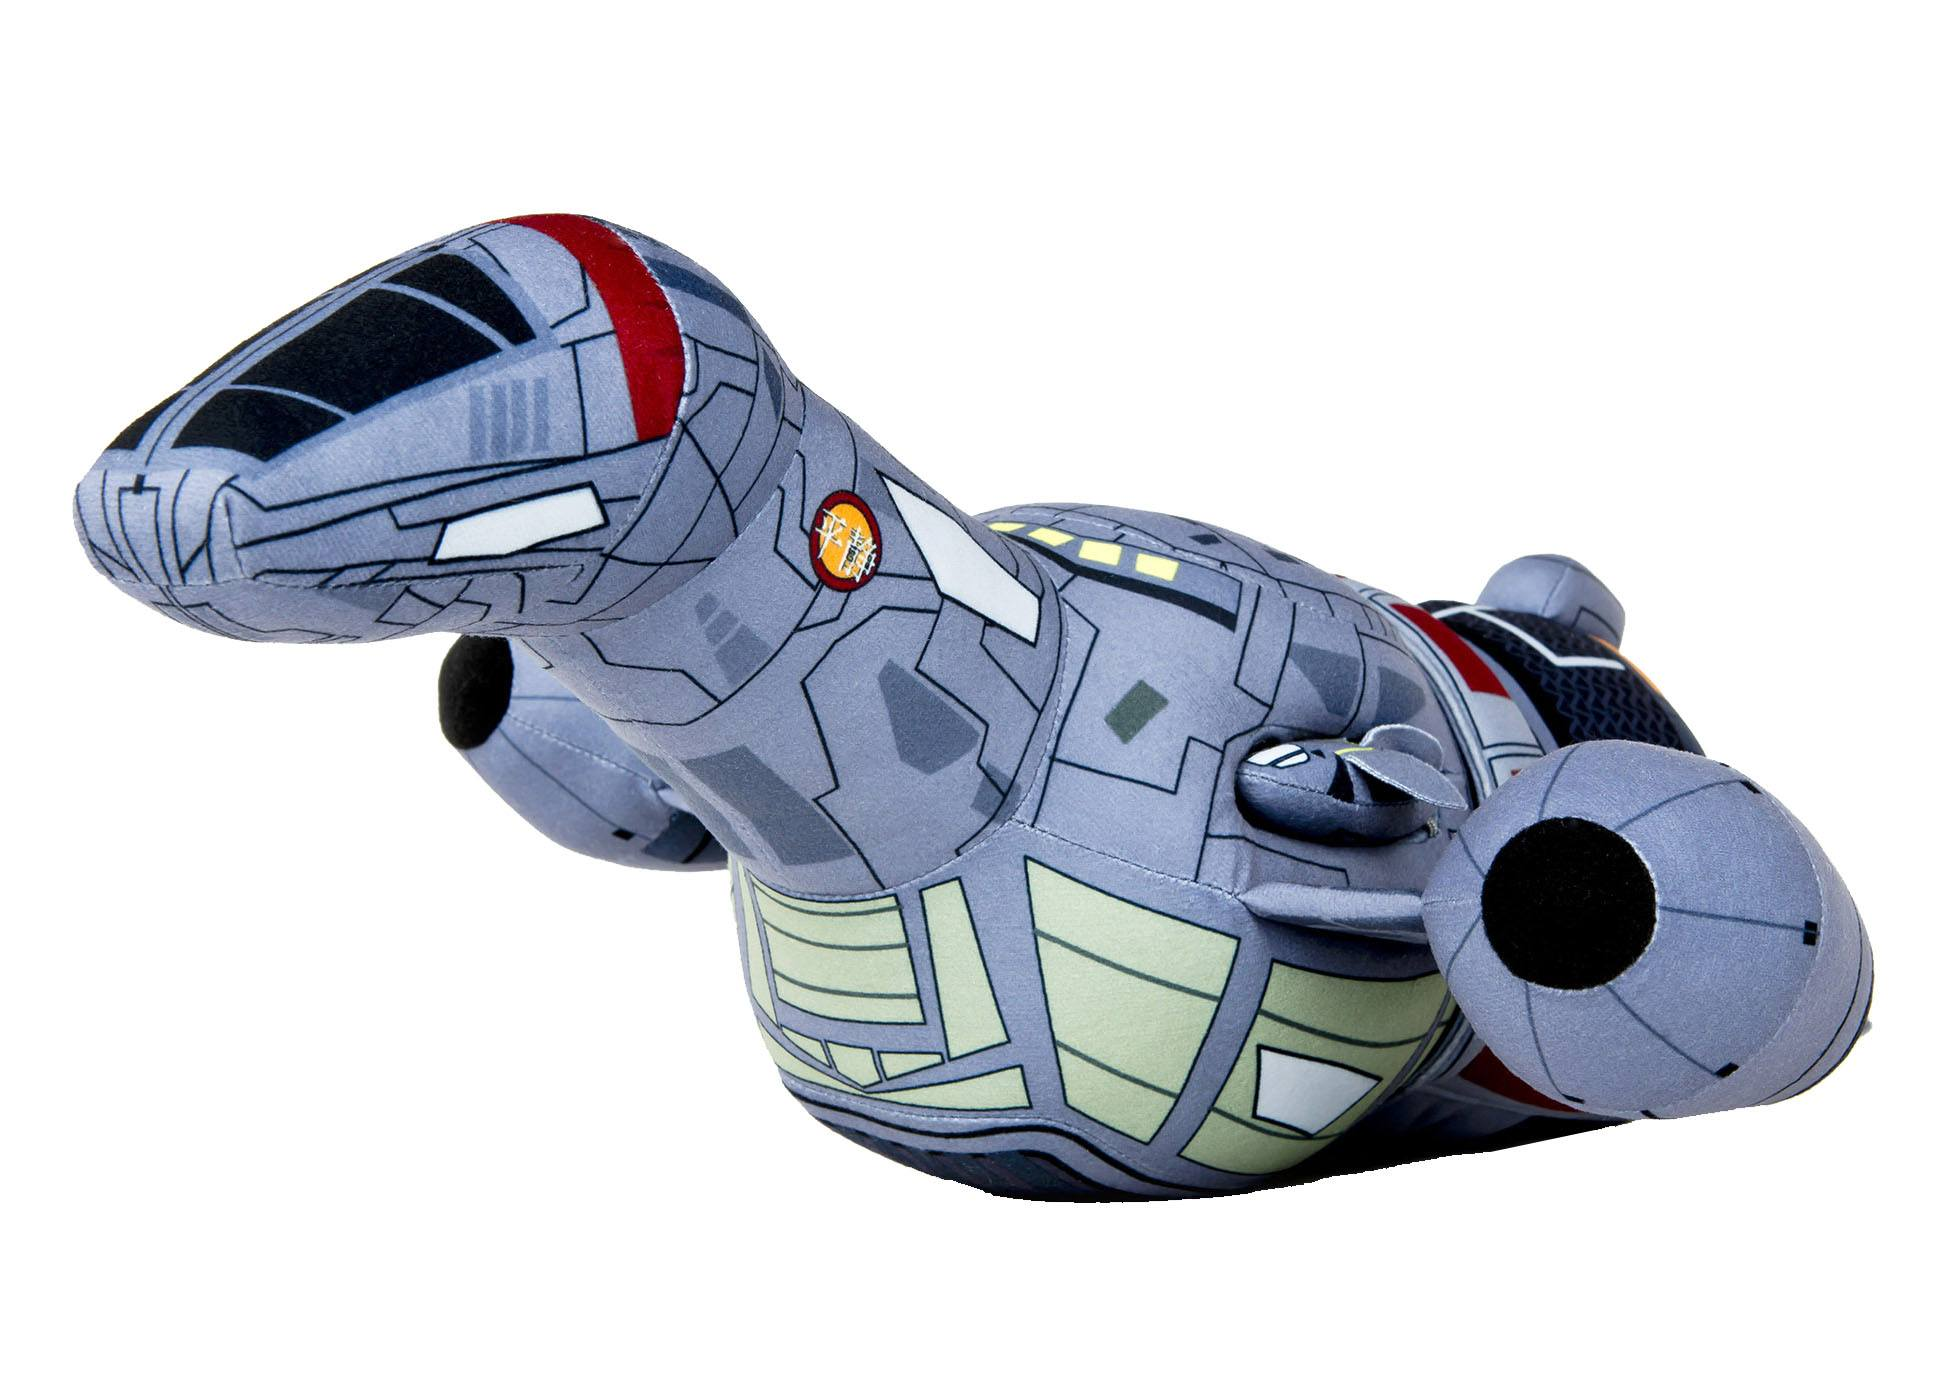 Firefly Plush Replica Serenity 46 cm